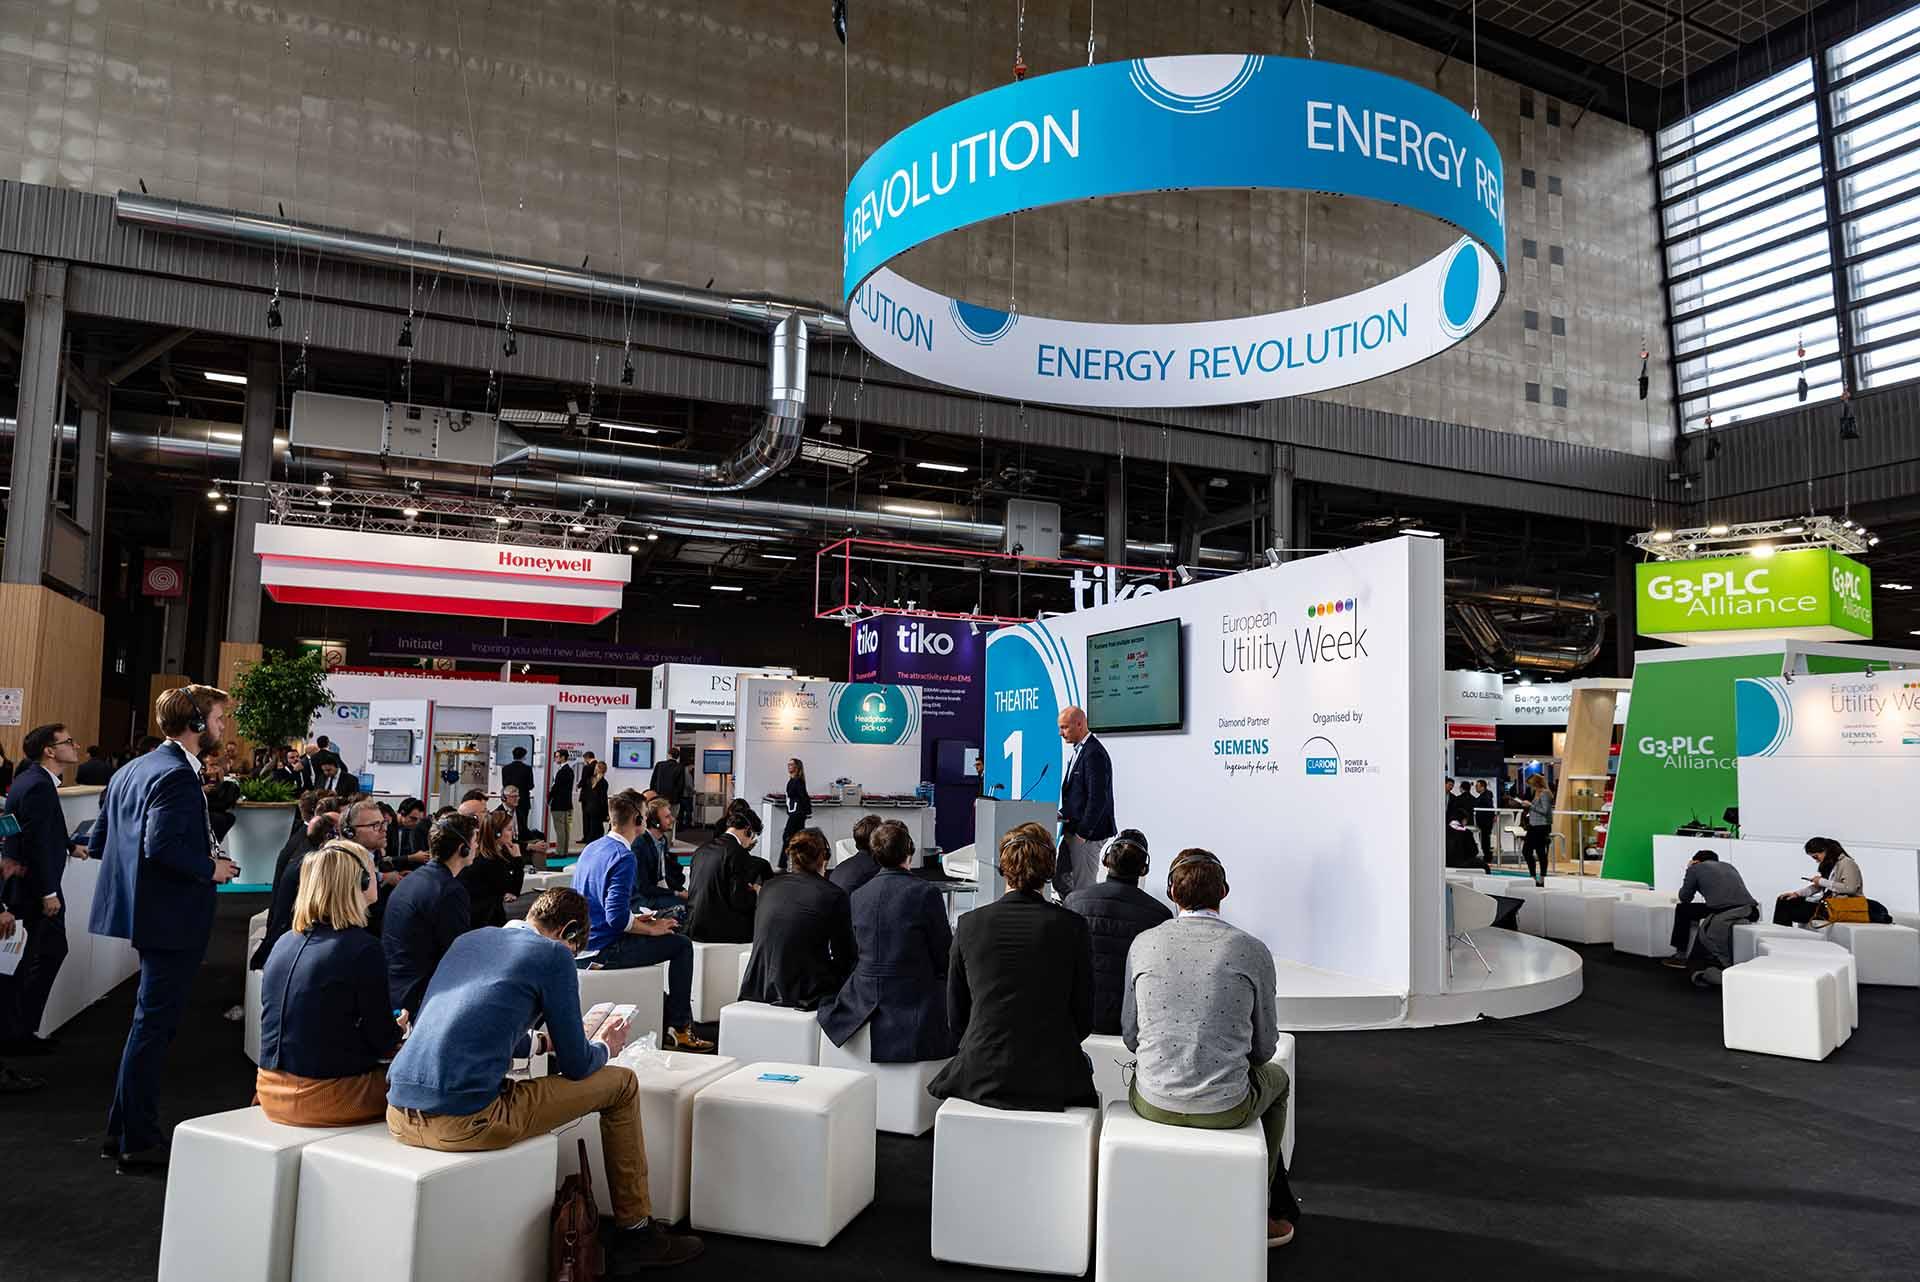 European Utility Week exhibition common areas construction